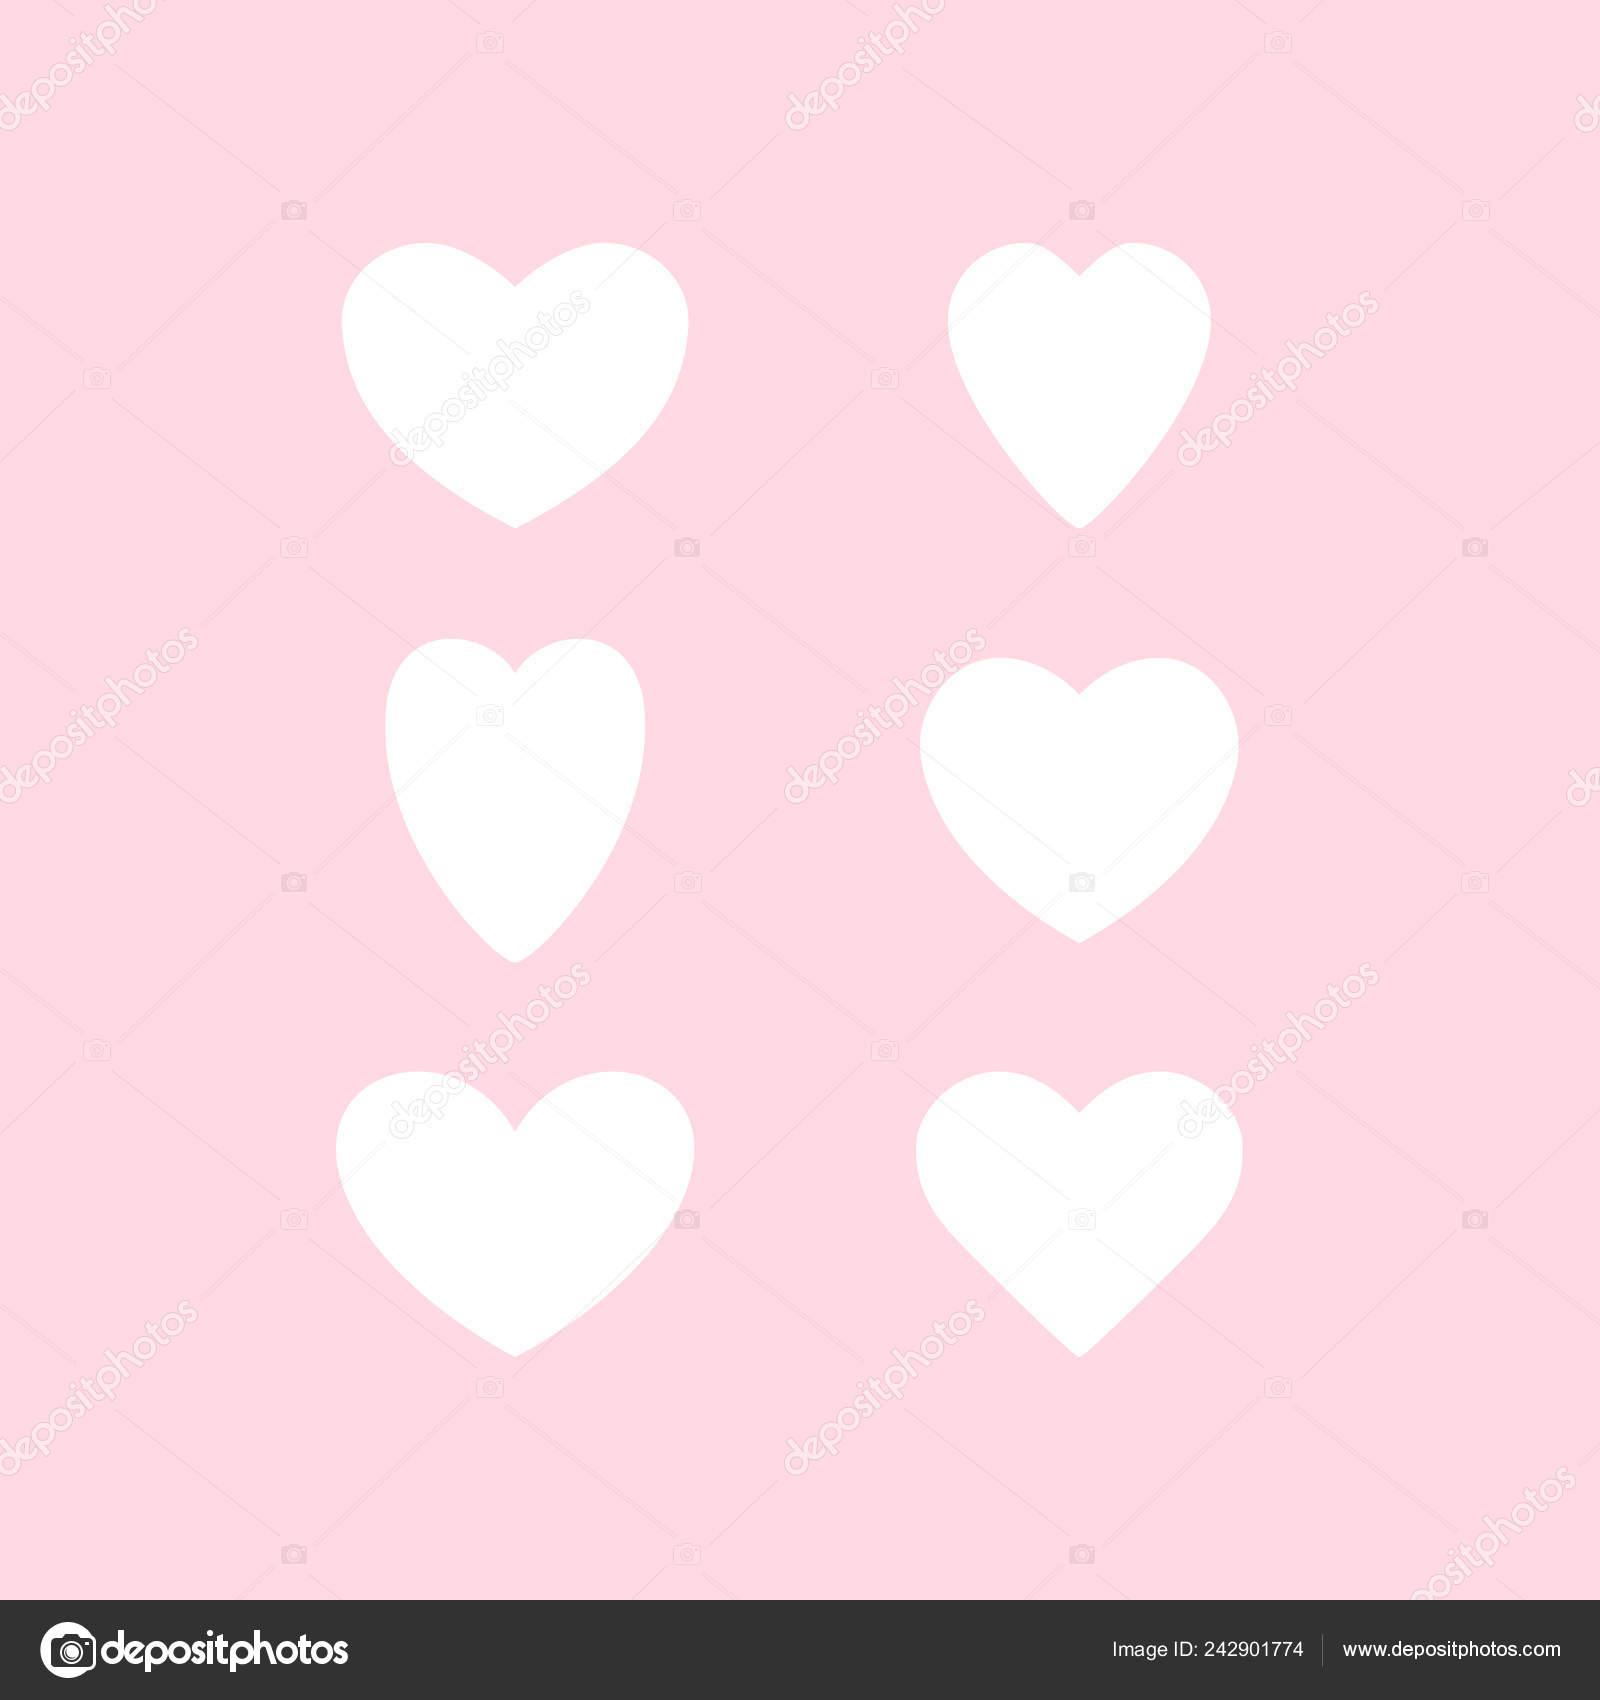 Heart Shapes Templates Vector Set Hearts Heart Templates Variety Heart Shapes Valentines Hearts Stock Vector C Baranovskaya 242901774